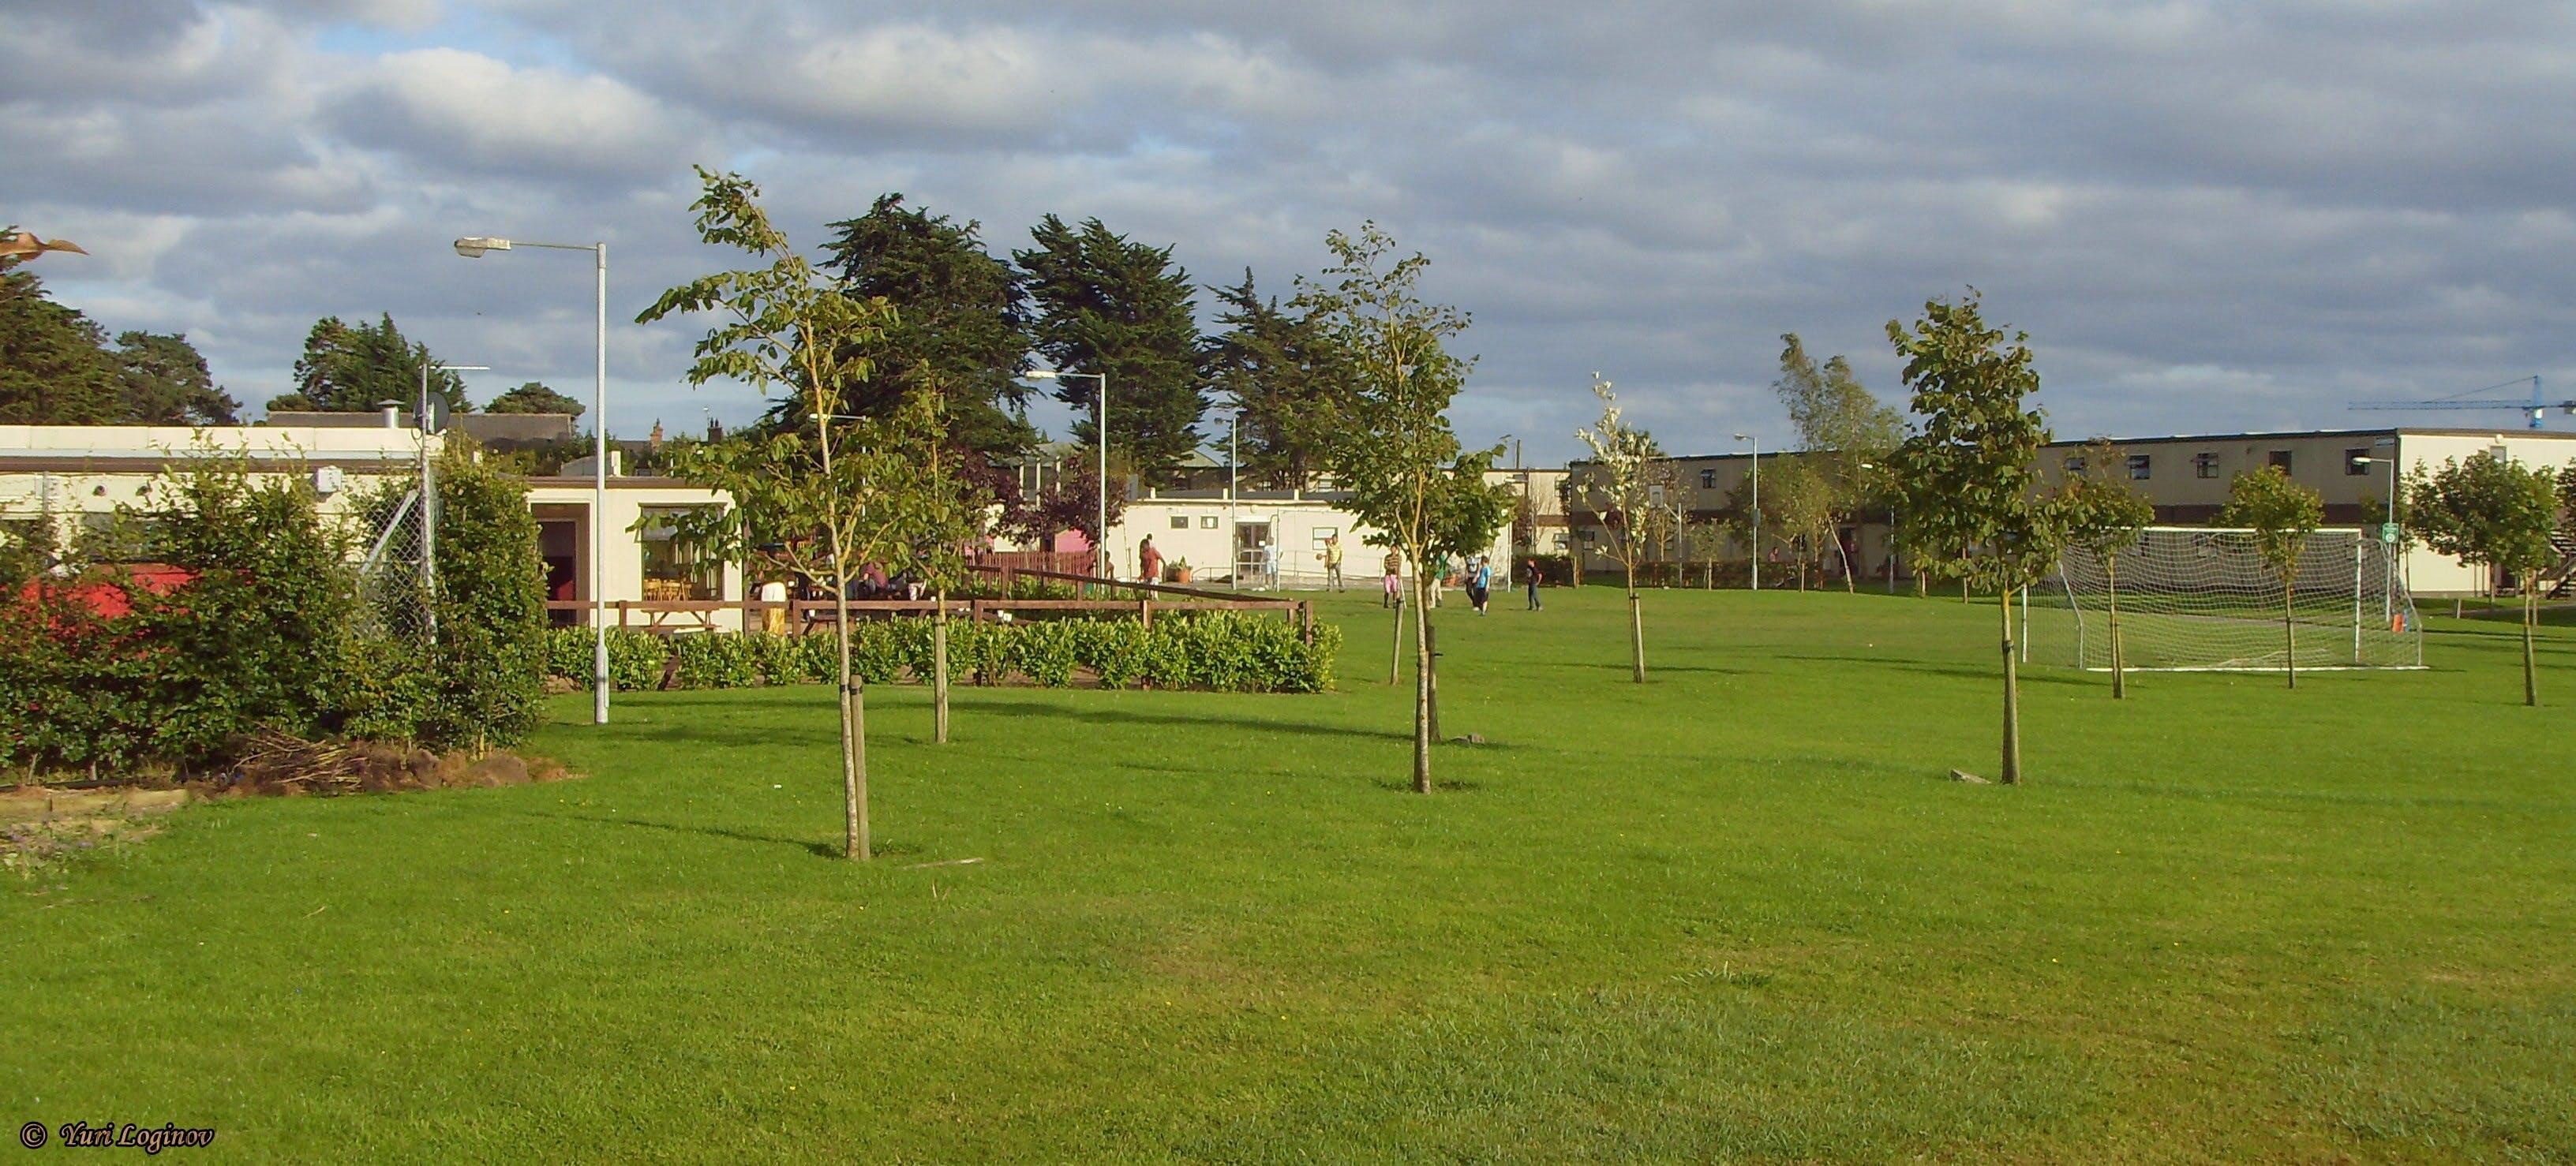 Free stock photo of dublin, ireland, Balseskin Centre, Finglas